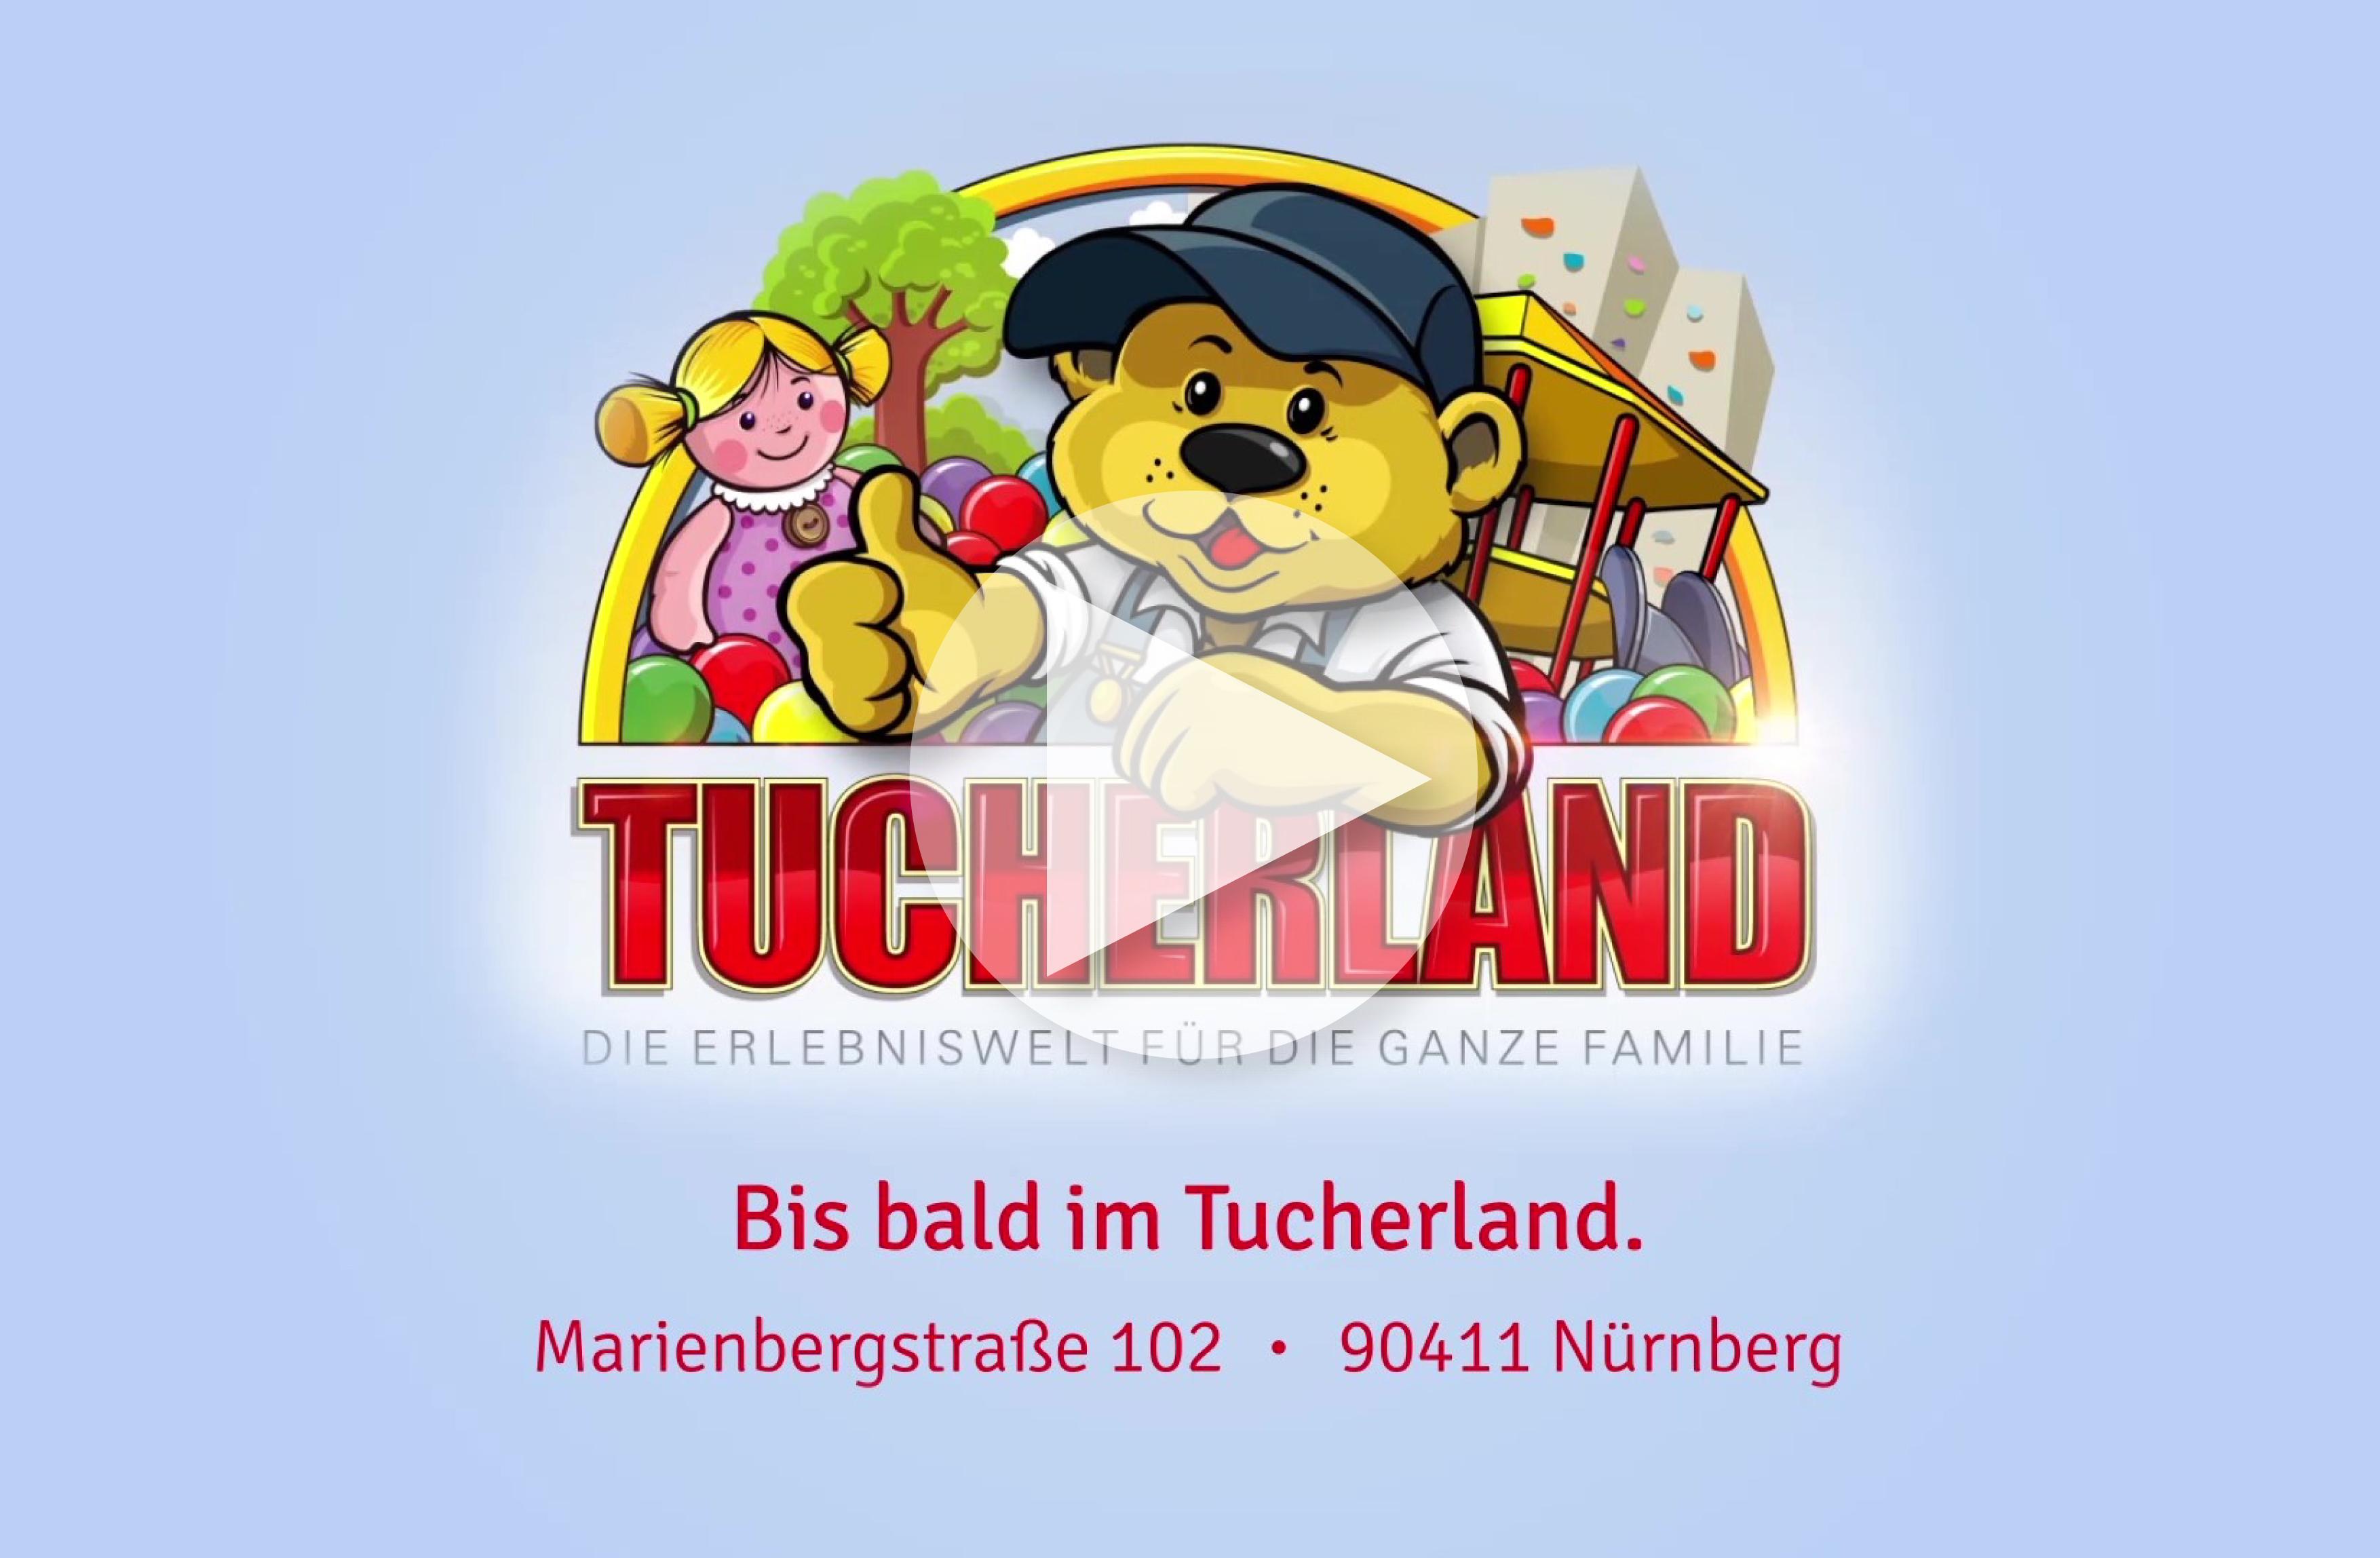 Imageclip Tucherland